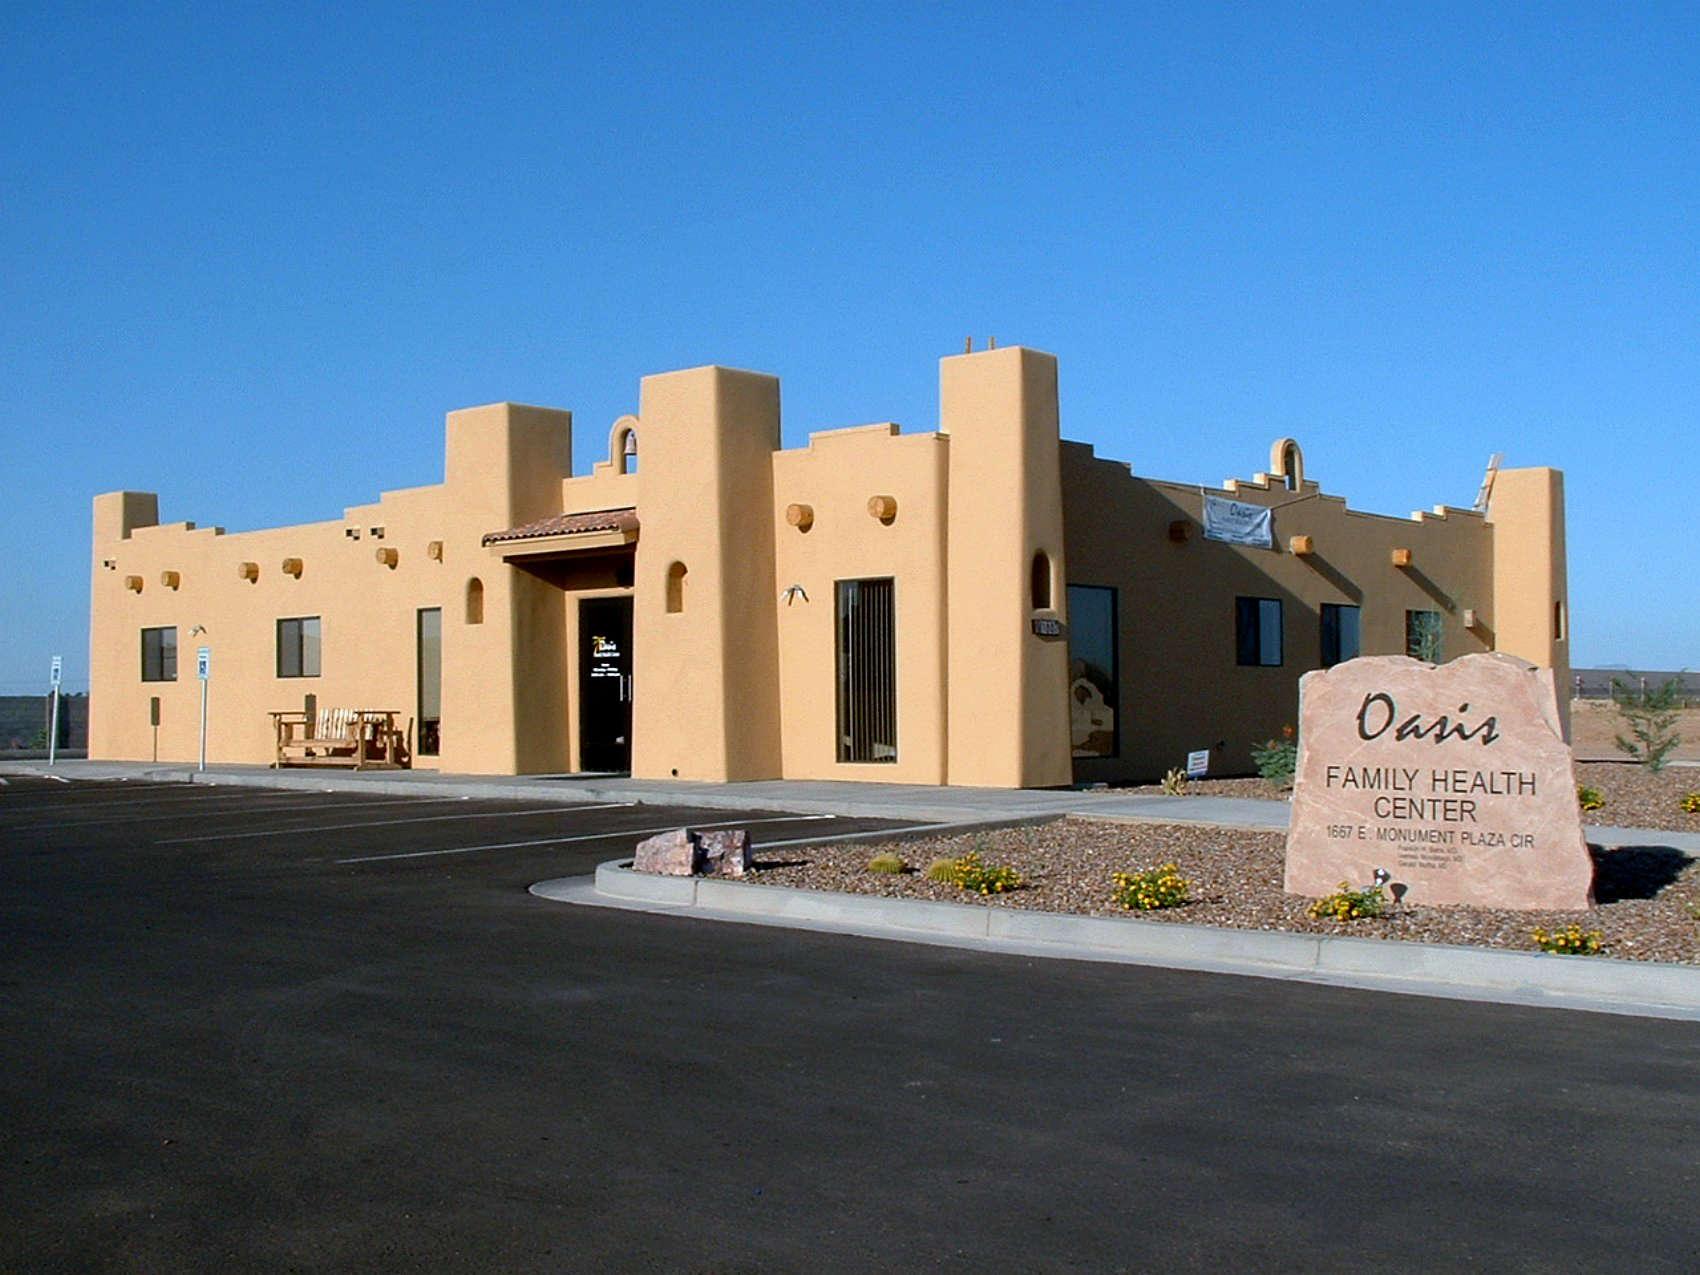 Oasis Family Health Center